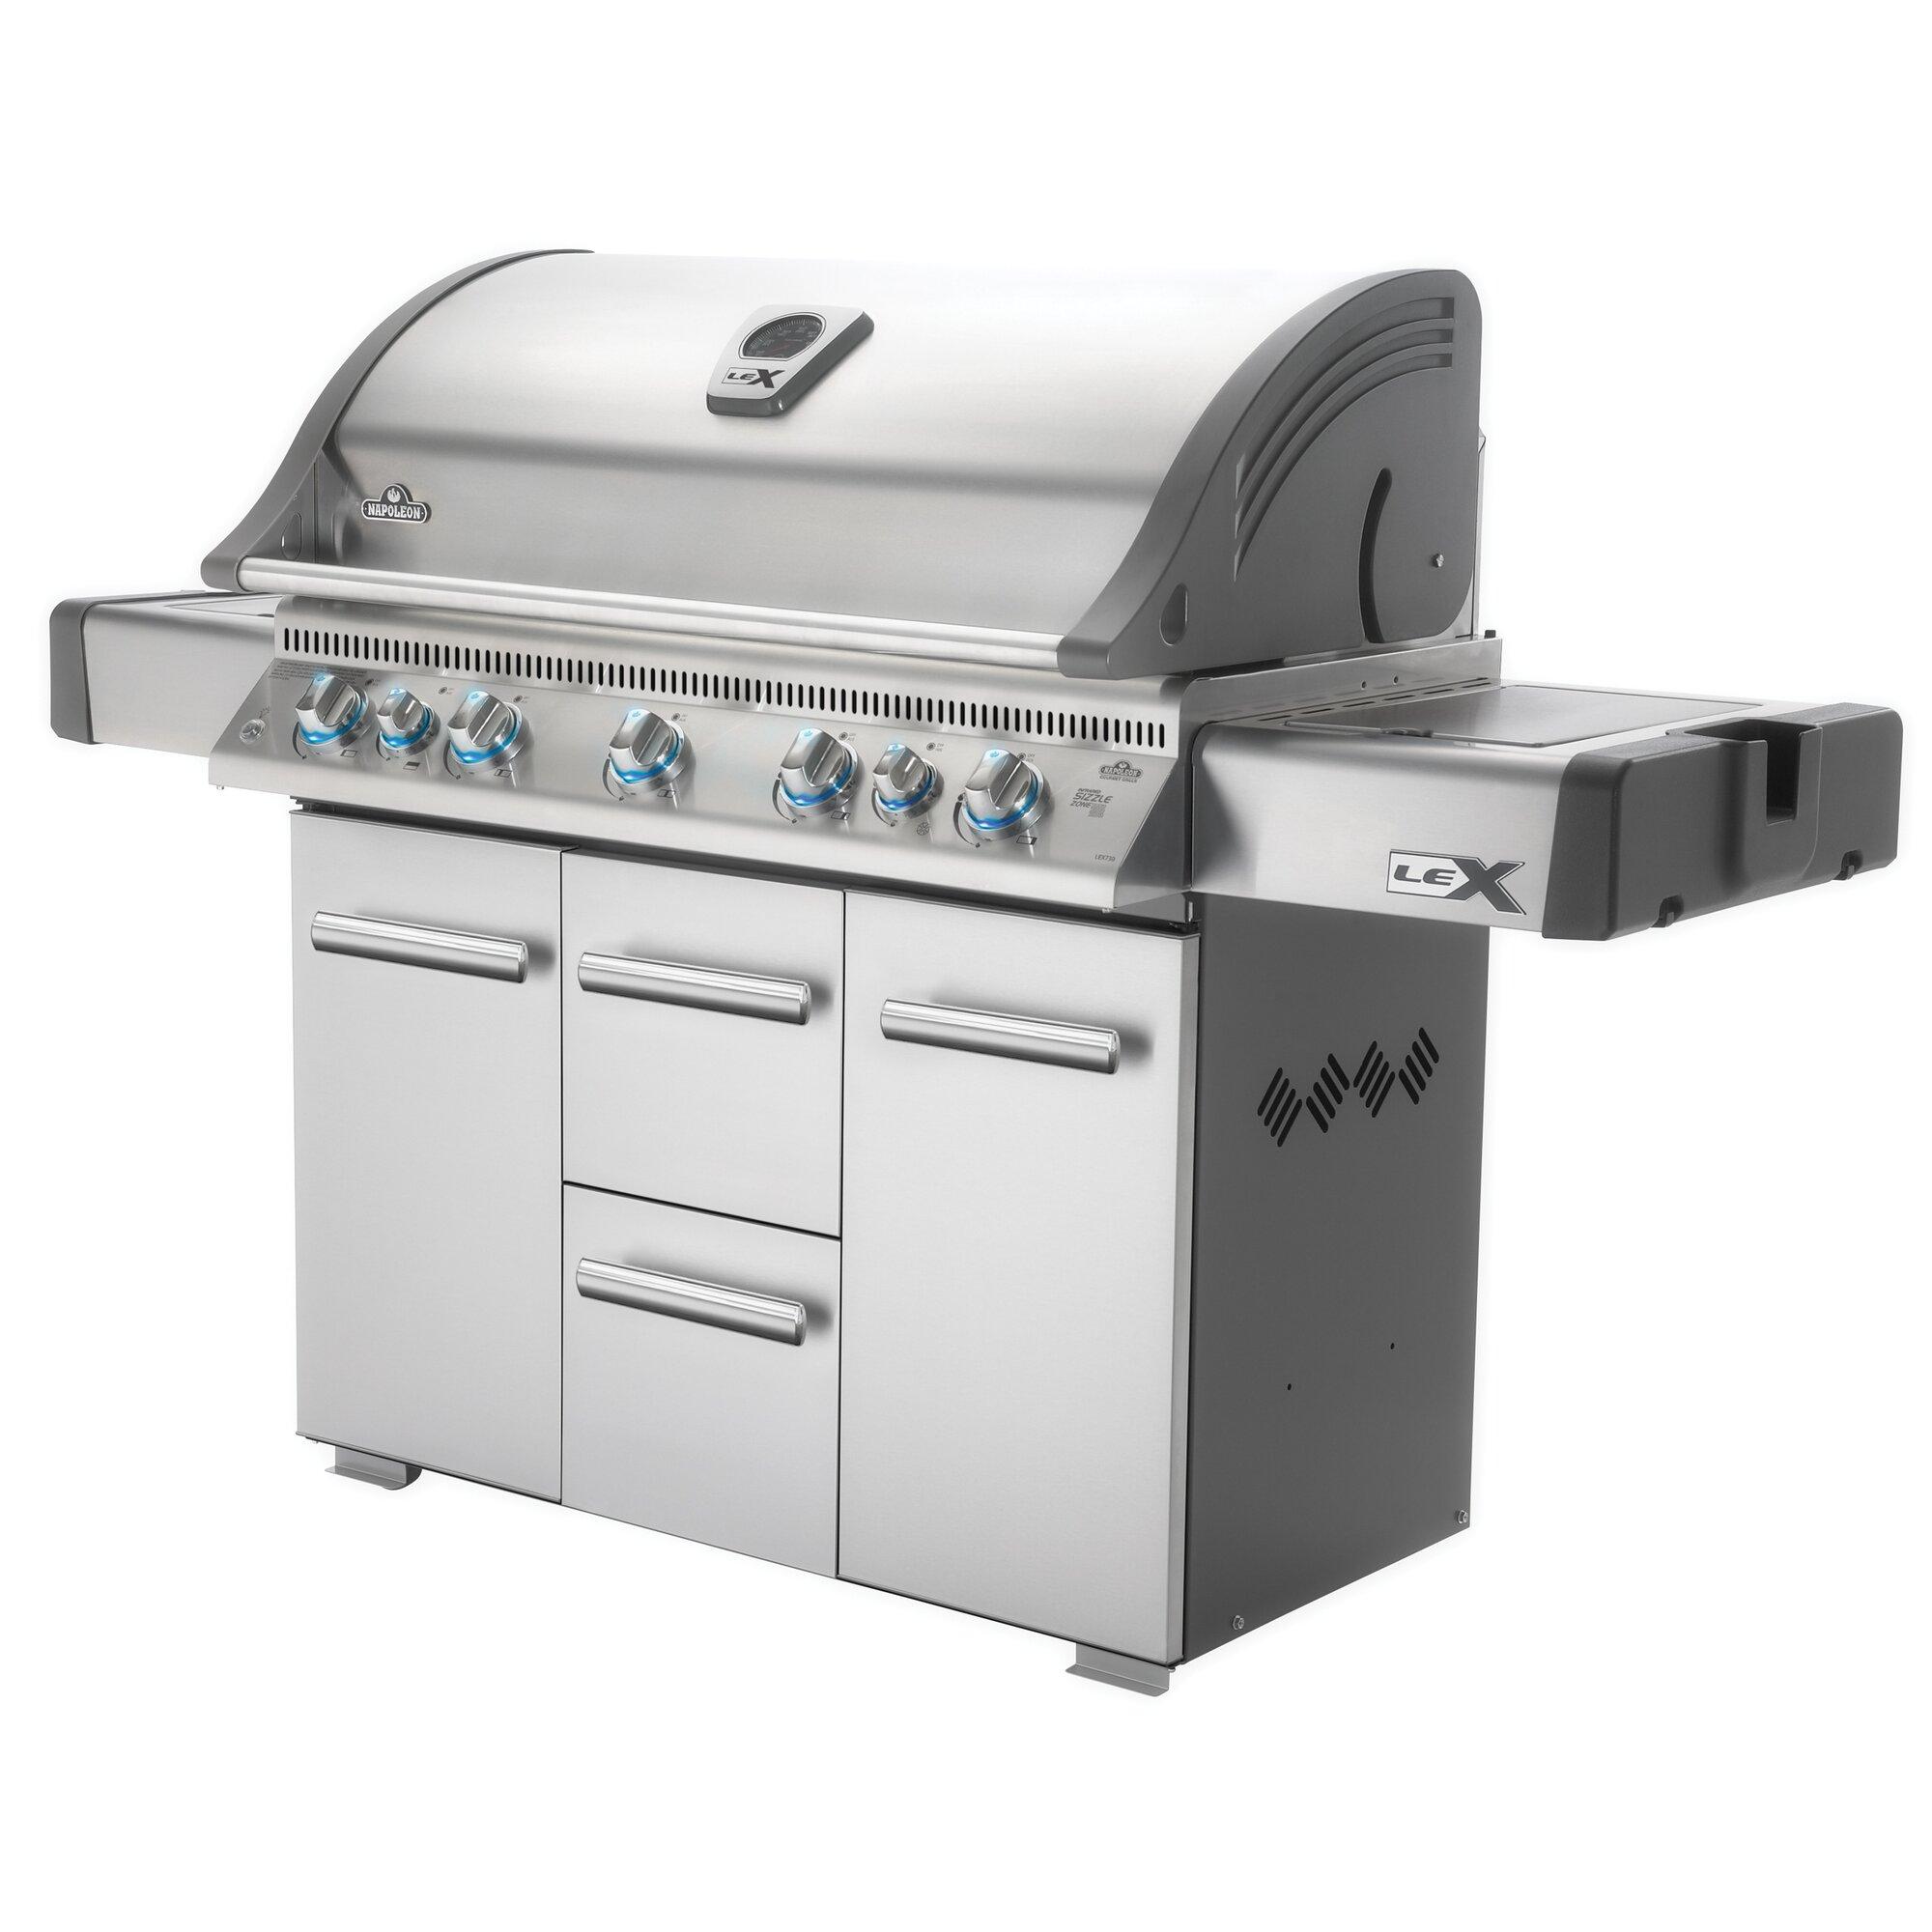 kitchenaid island grill. the best gas grills source kitchenaid 7 burner island grill rated home decorating. n